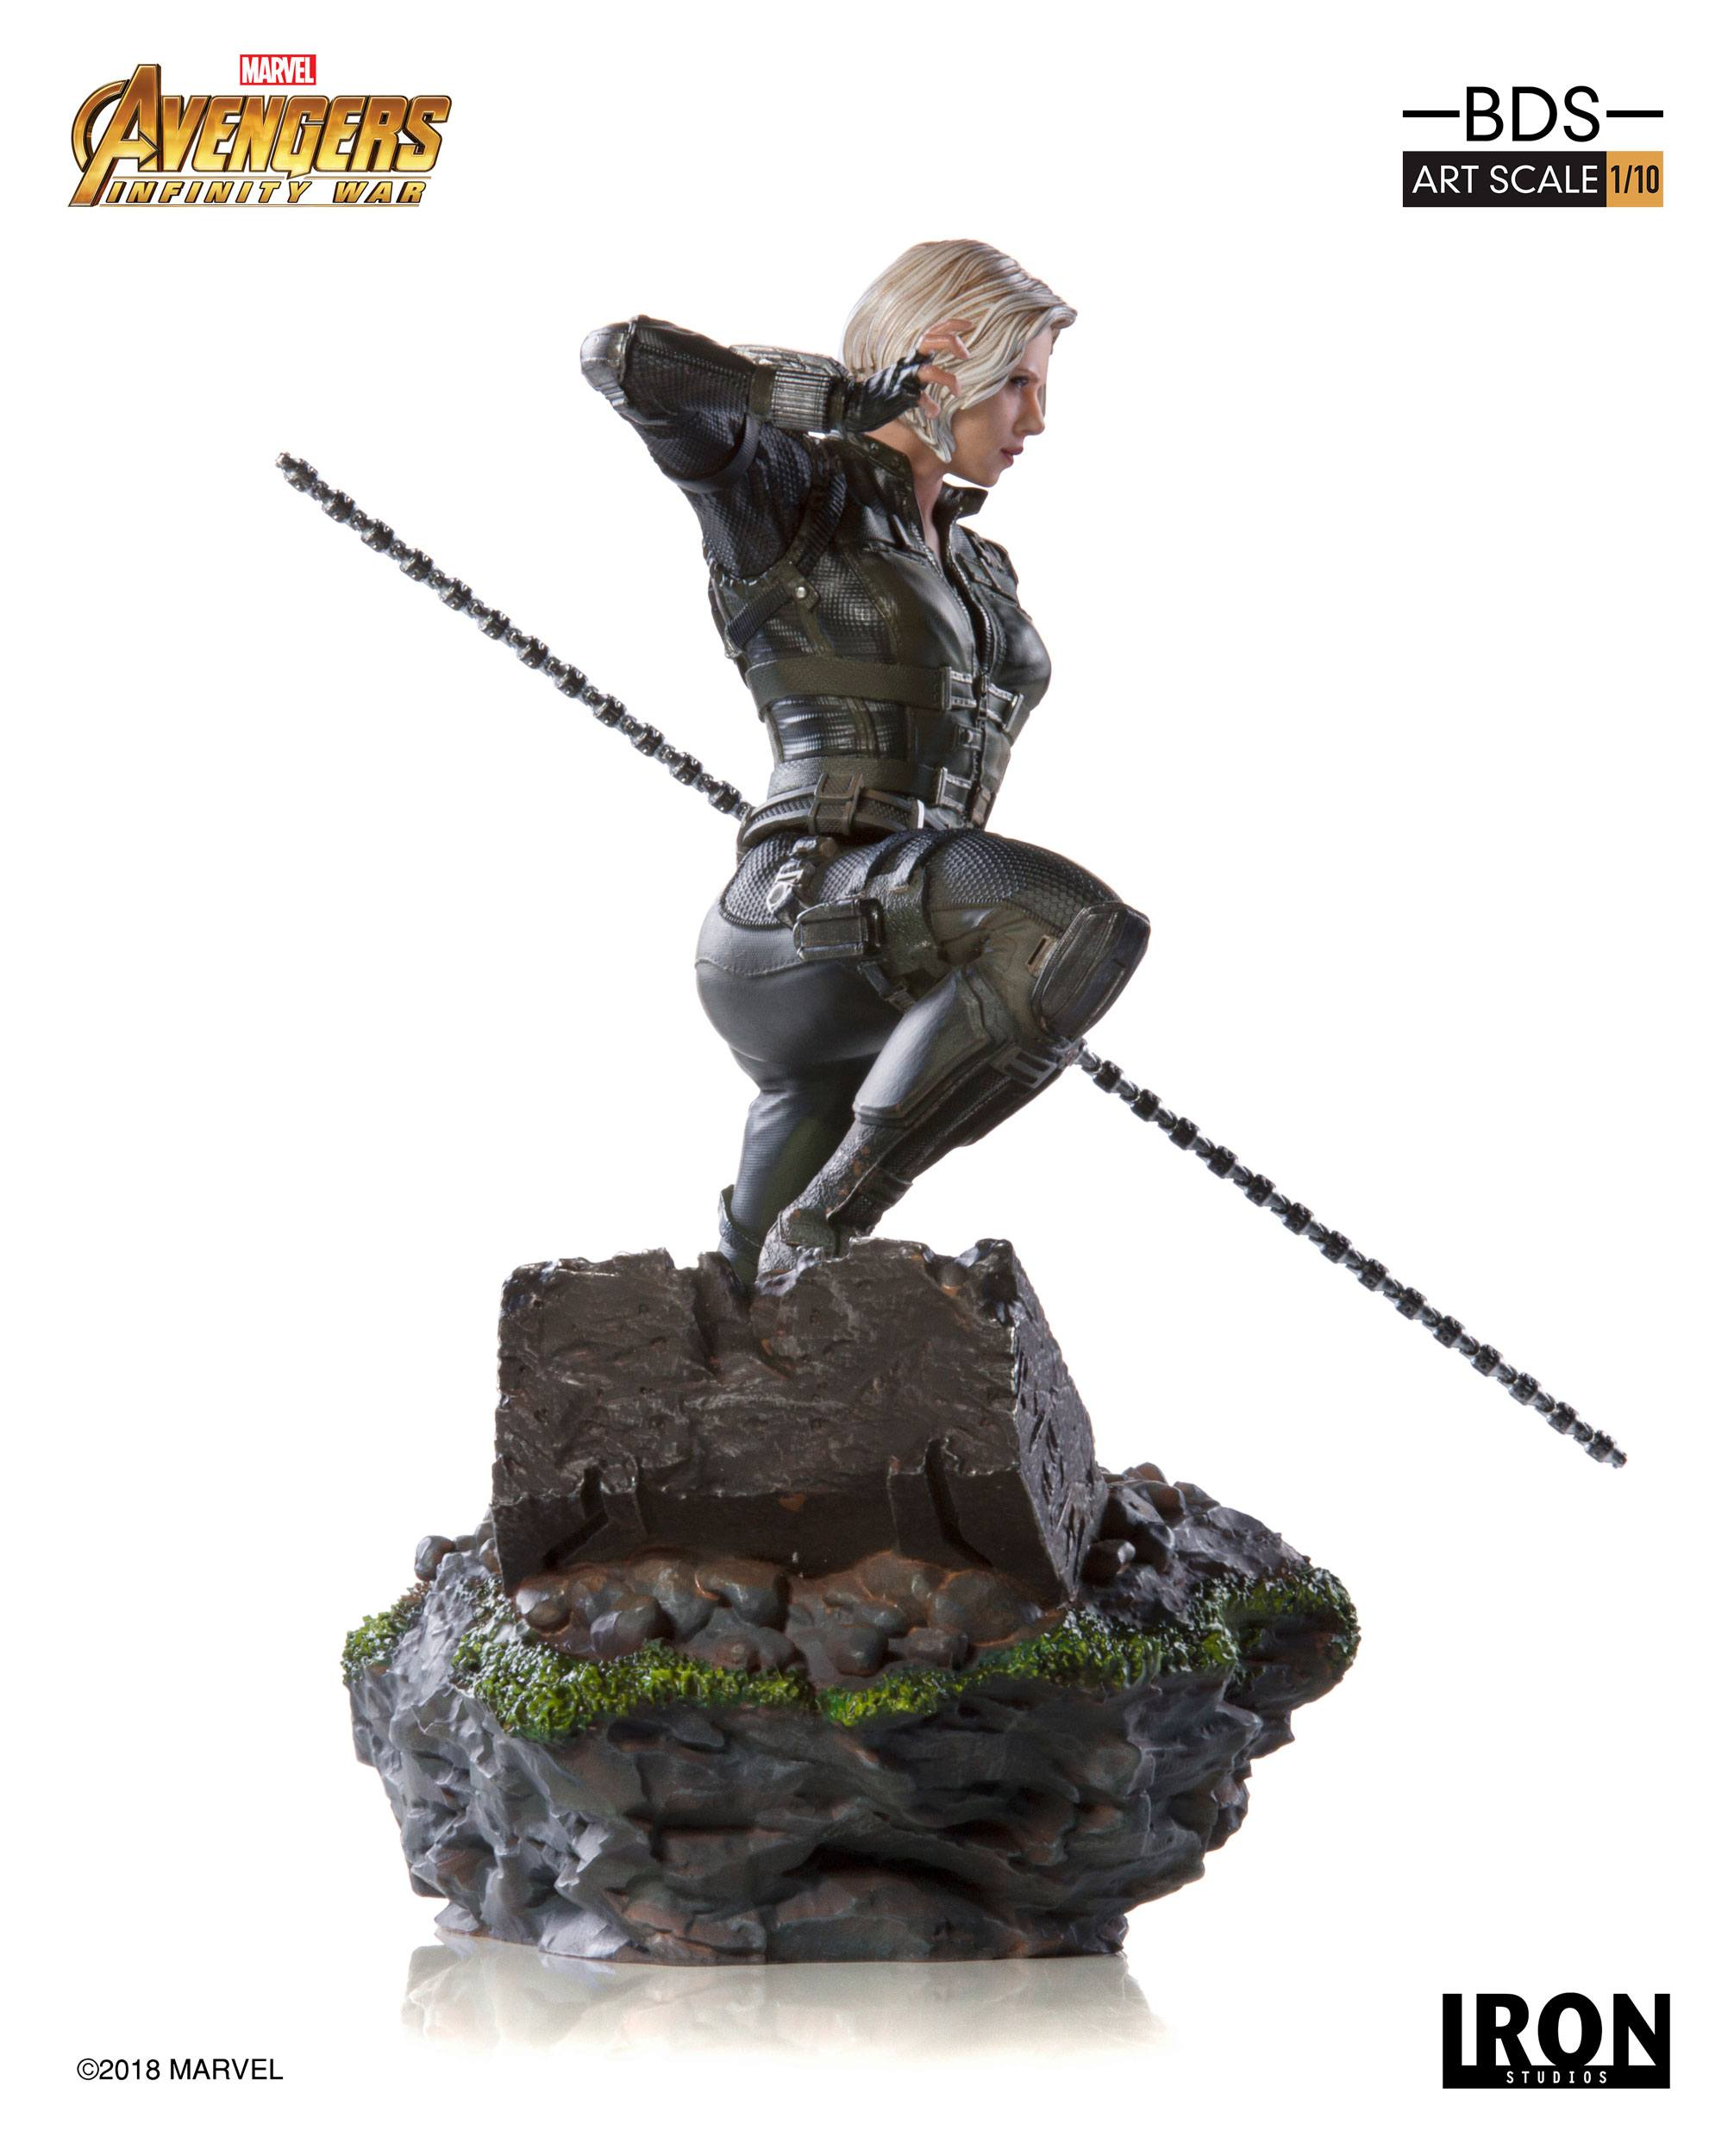 Avengers Infinity War BDS Art Scale Statue 1/10 Black Widow 18 cm - Animegami Store